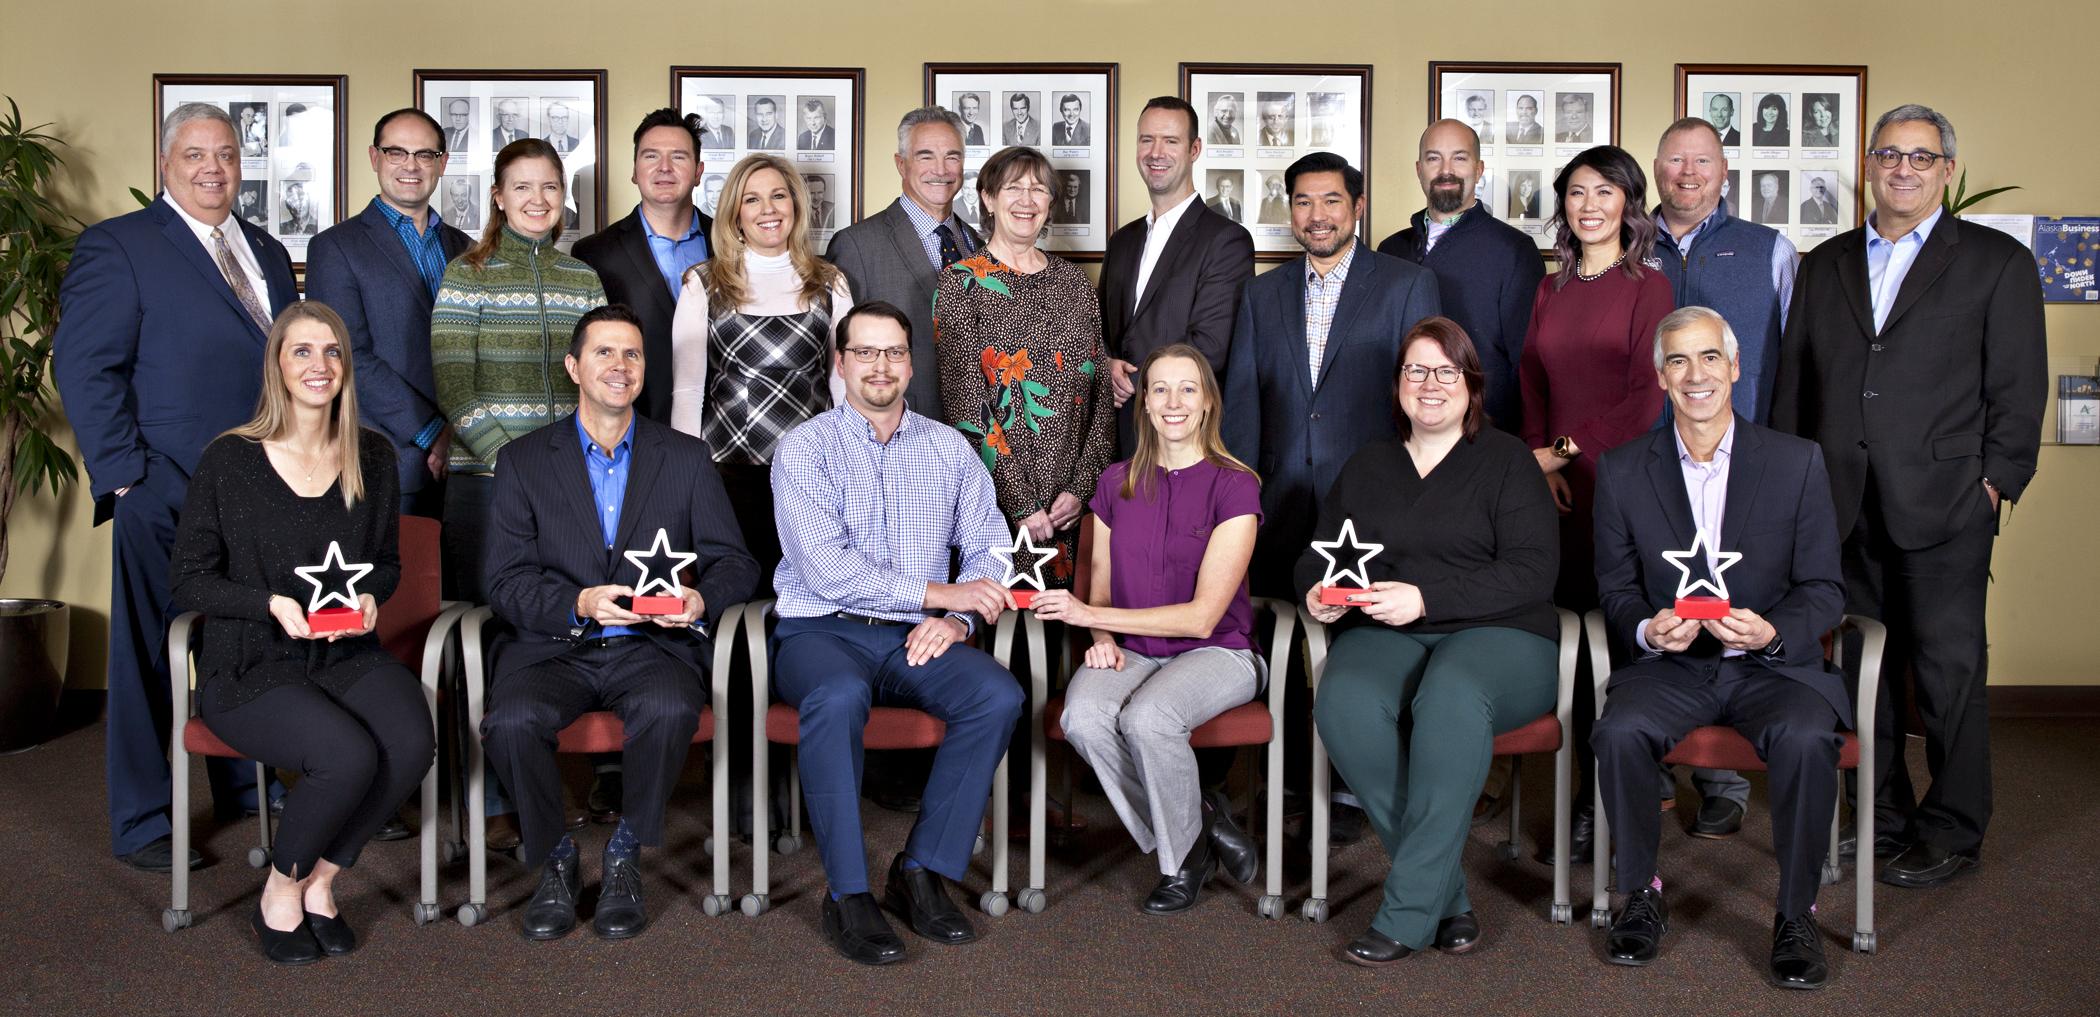 2019 - 2020 ACC Board of Directors